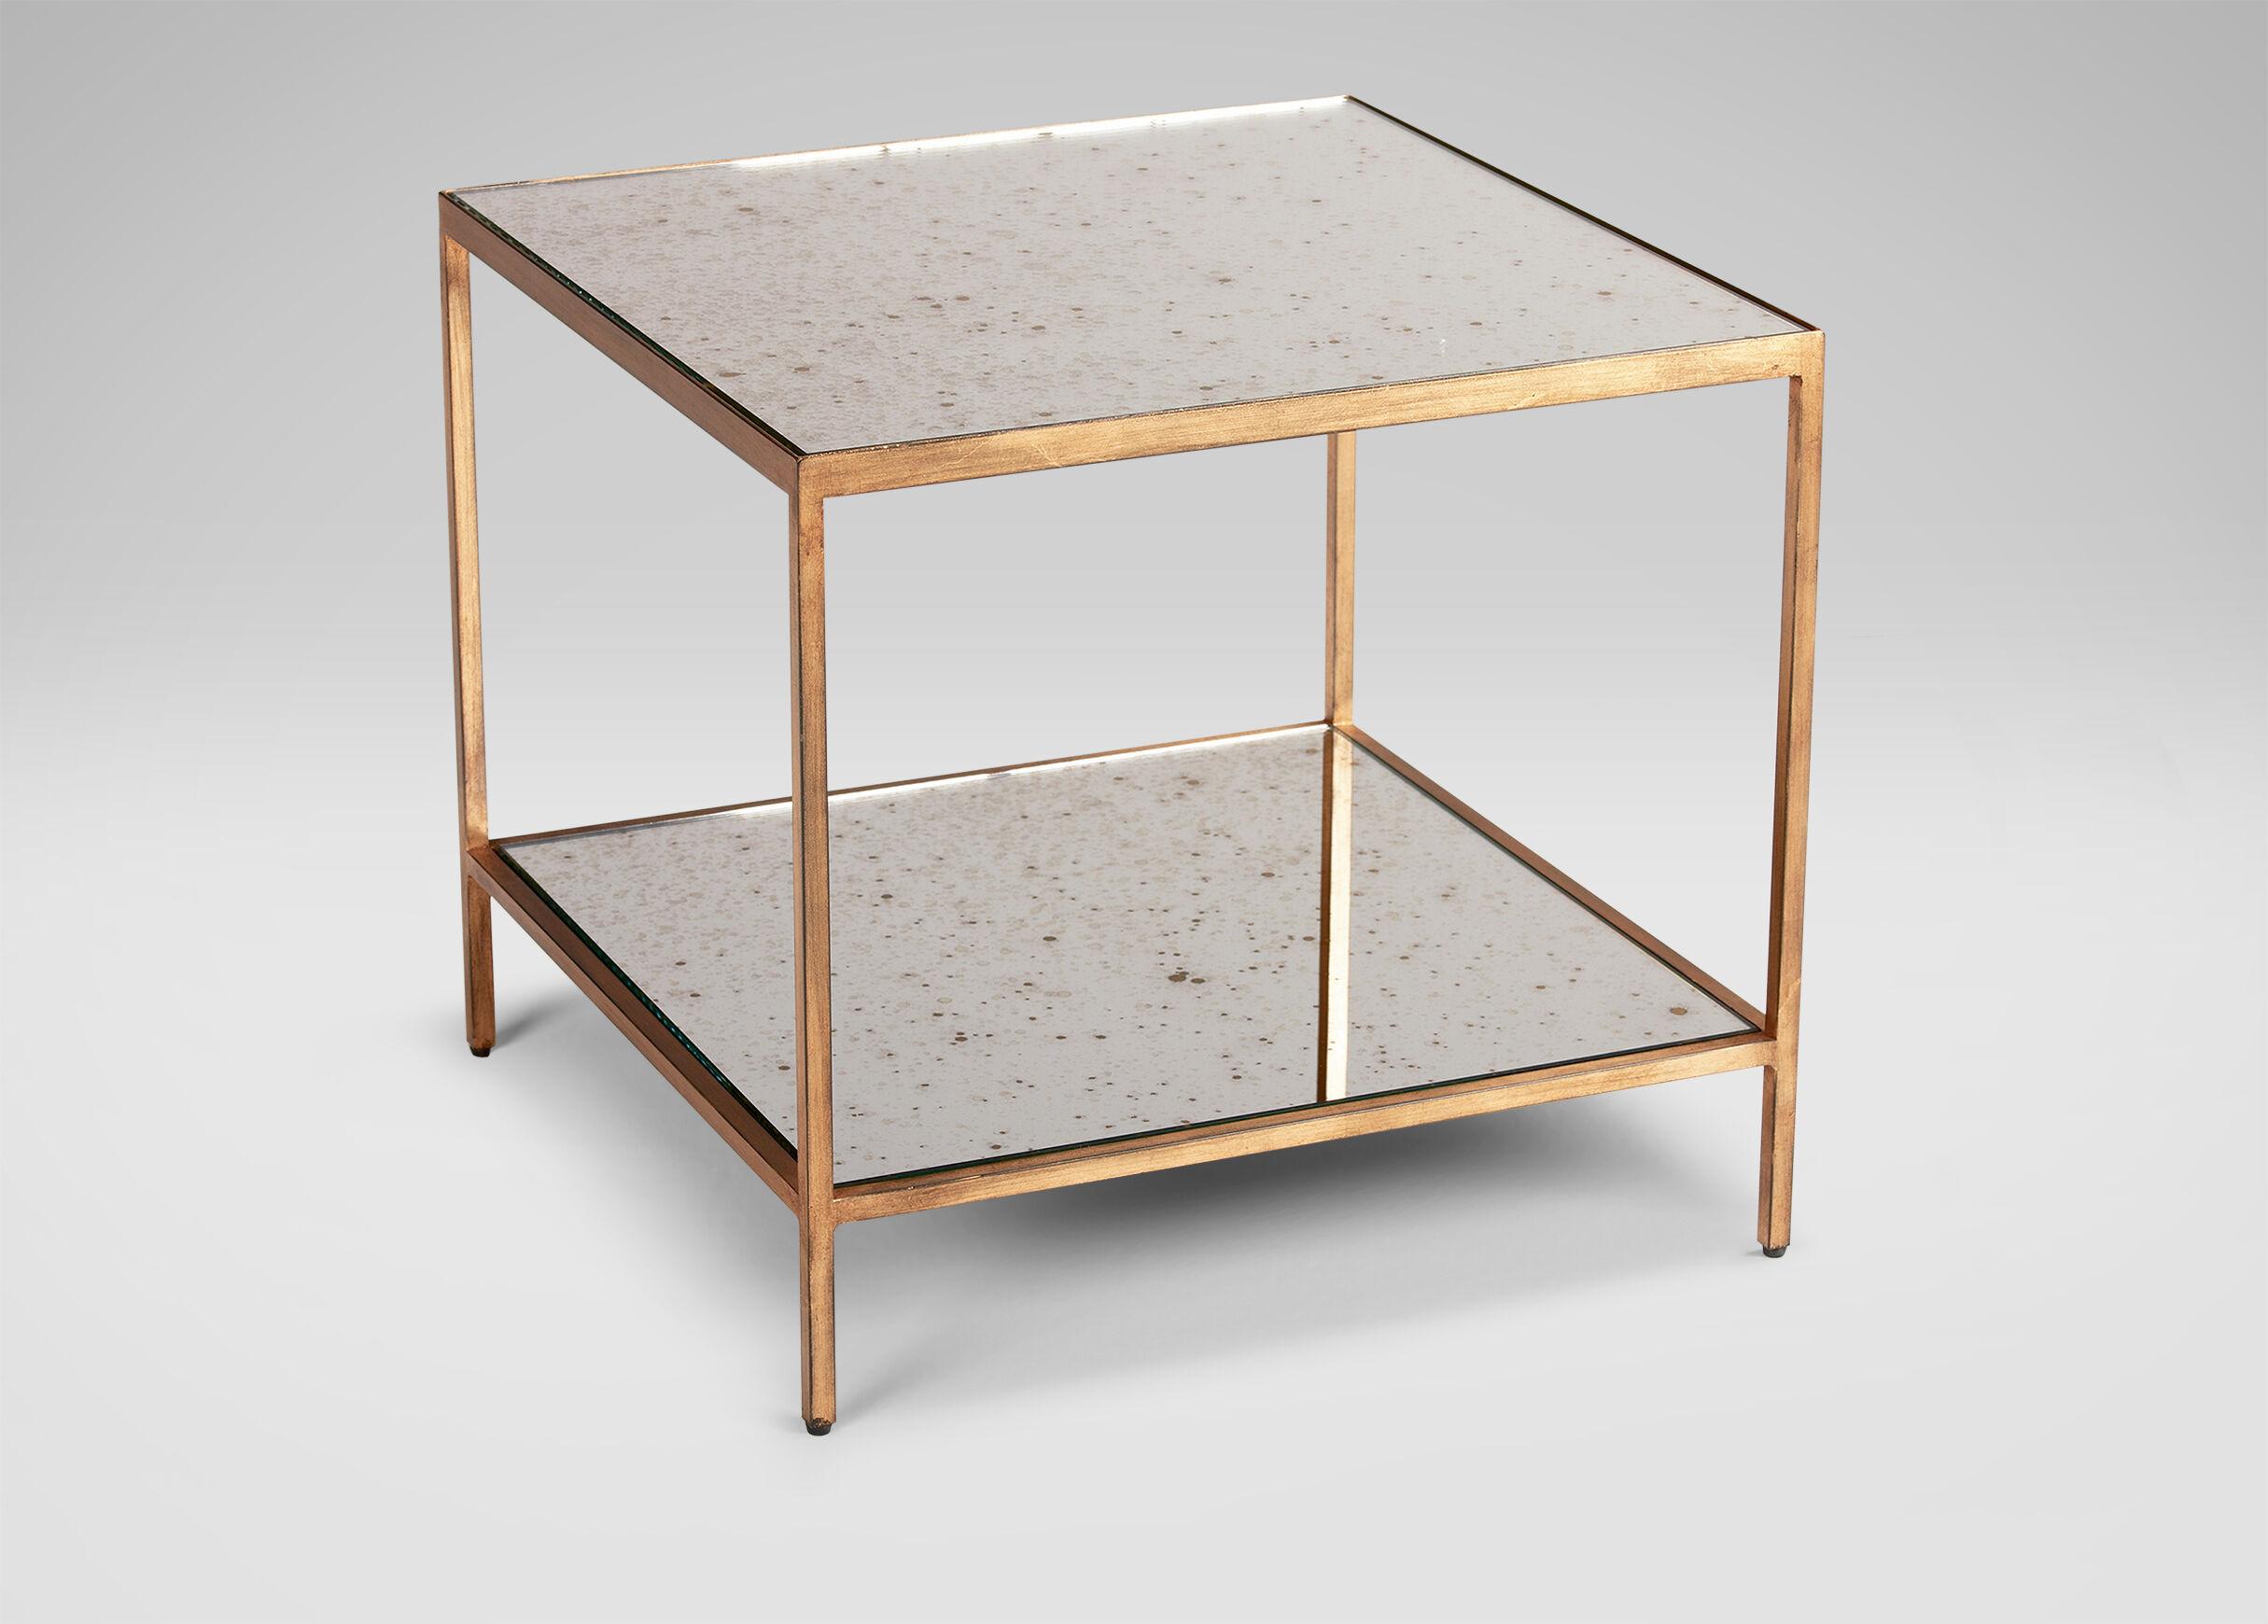 zachary bunching coffee table | coffee tables Bunching Coffee Tables